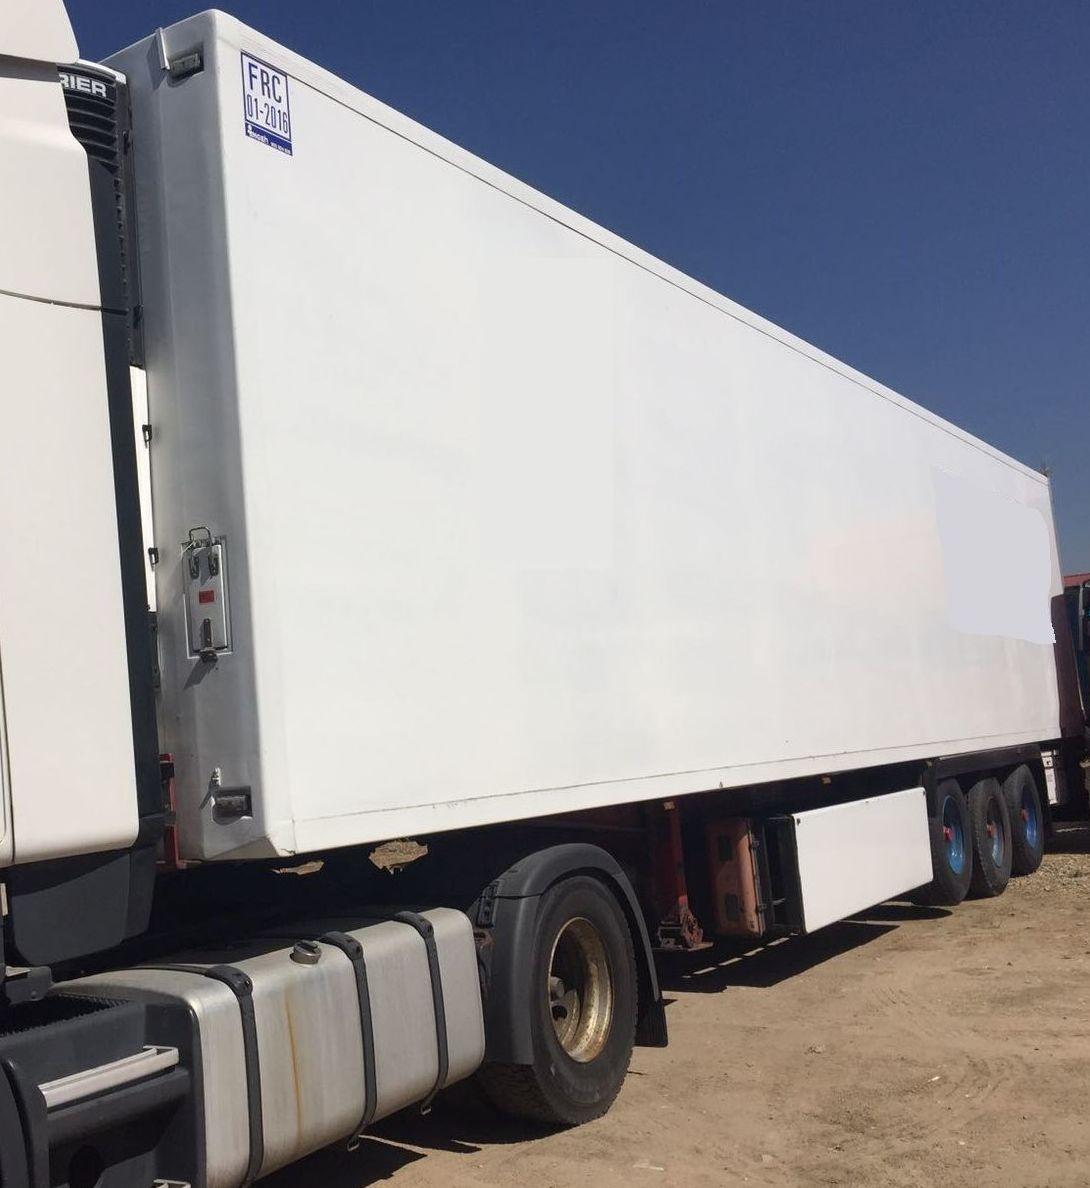 MIROFRET: Vehículos industriales de Emirtrucks Trading